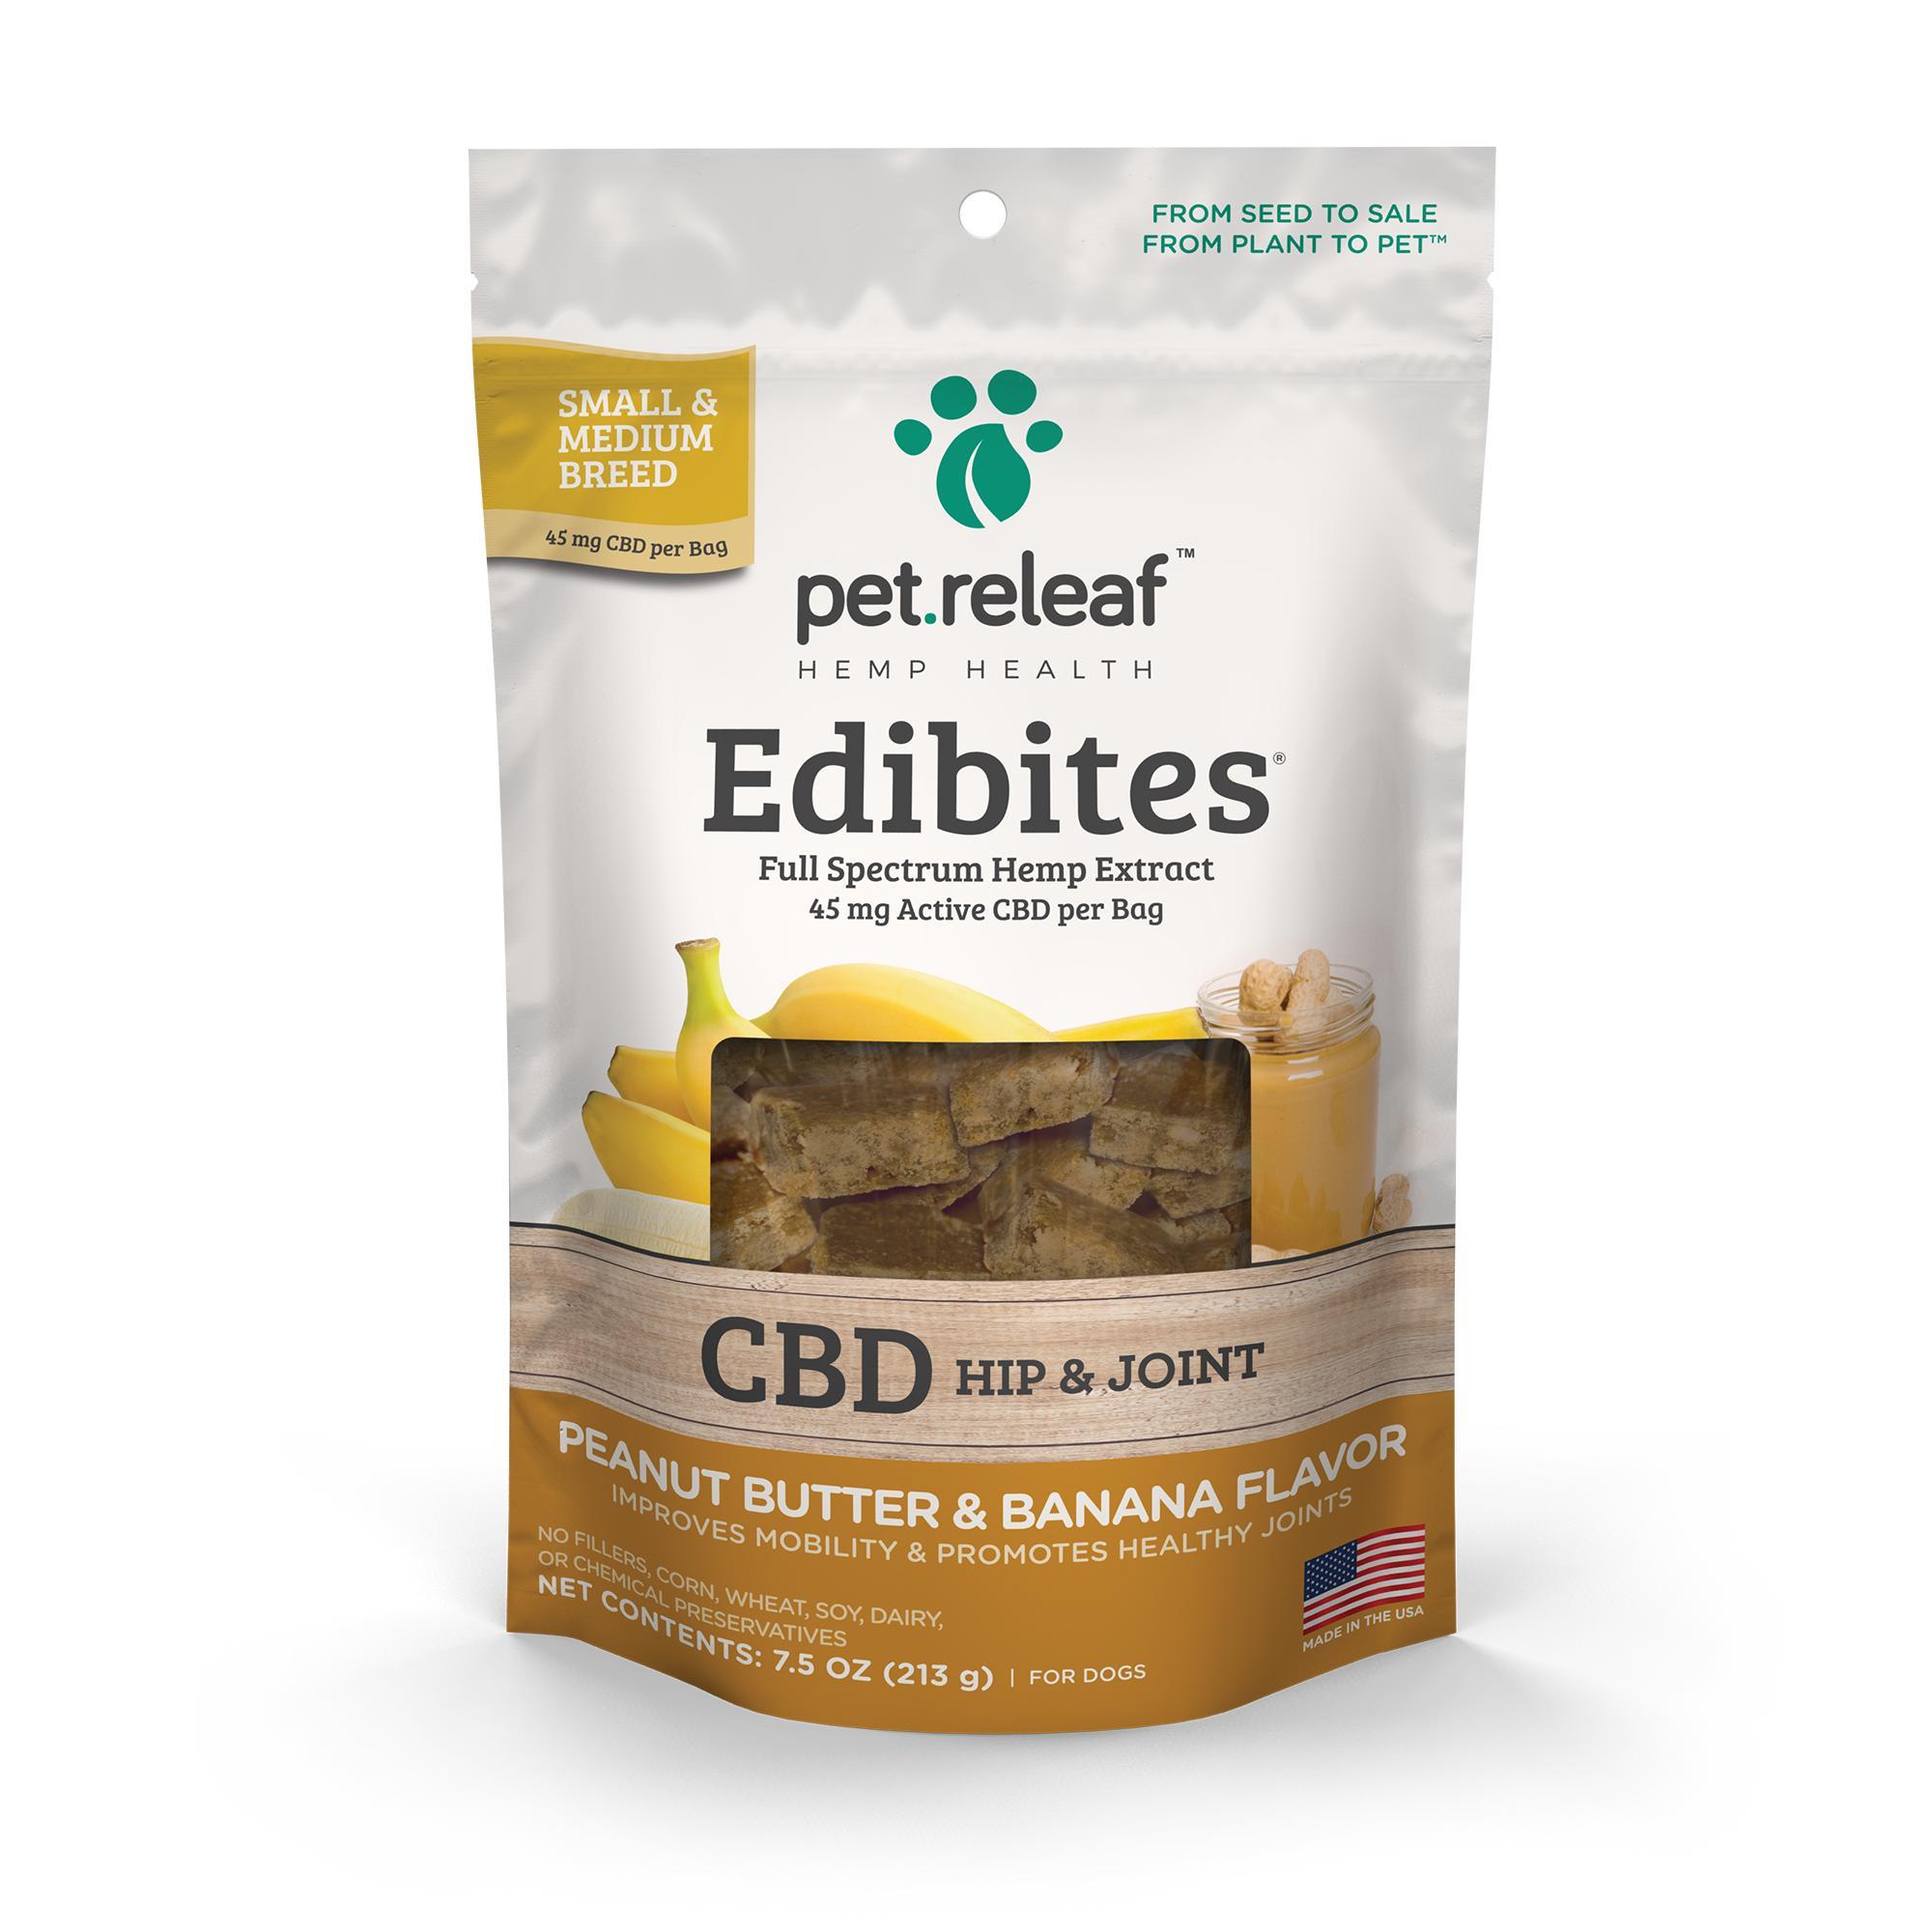 Pet Releaf Edibites Hip & Joint Peanut Butter & Banana Small & Medium Breed Dog Supplement, 7.5-oz